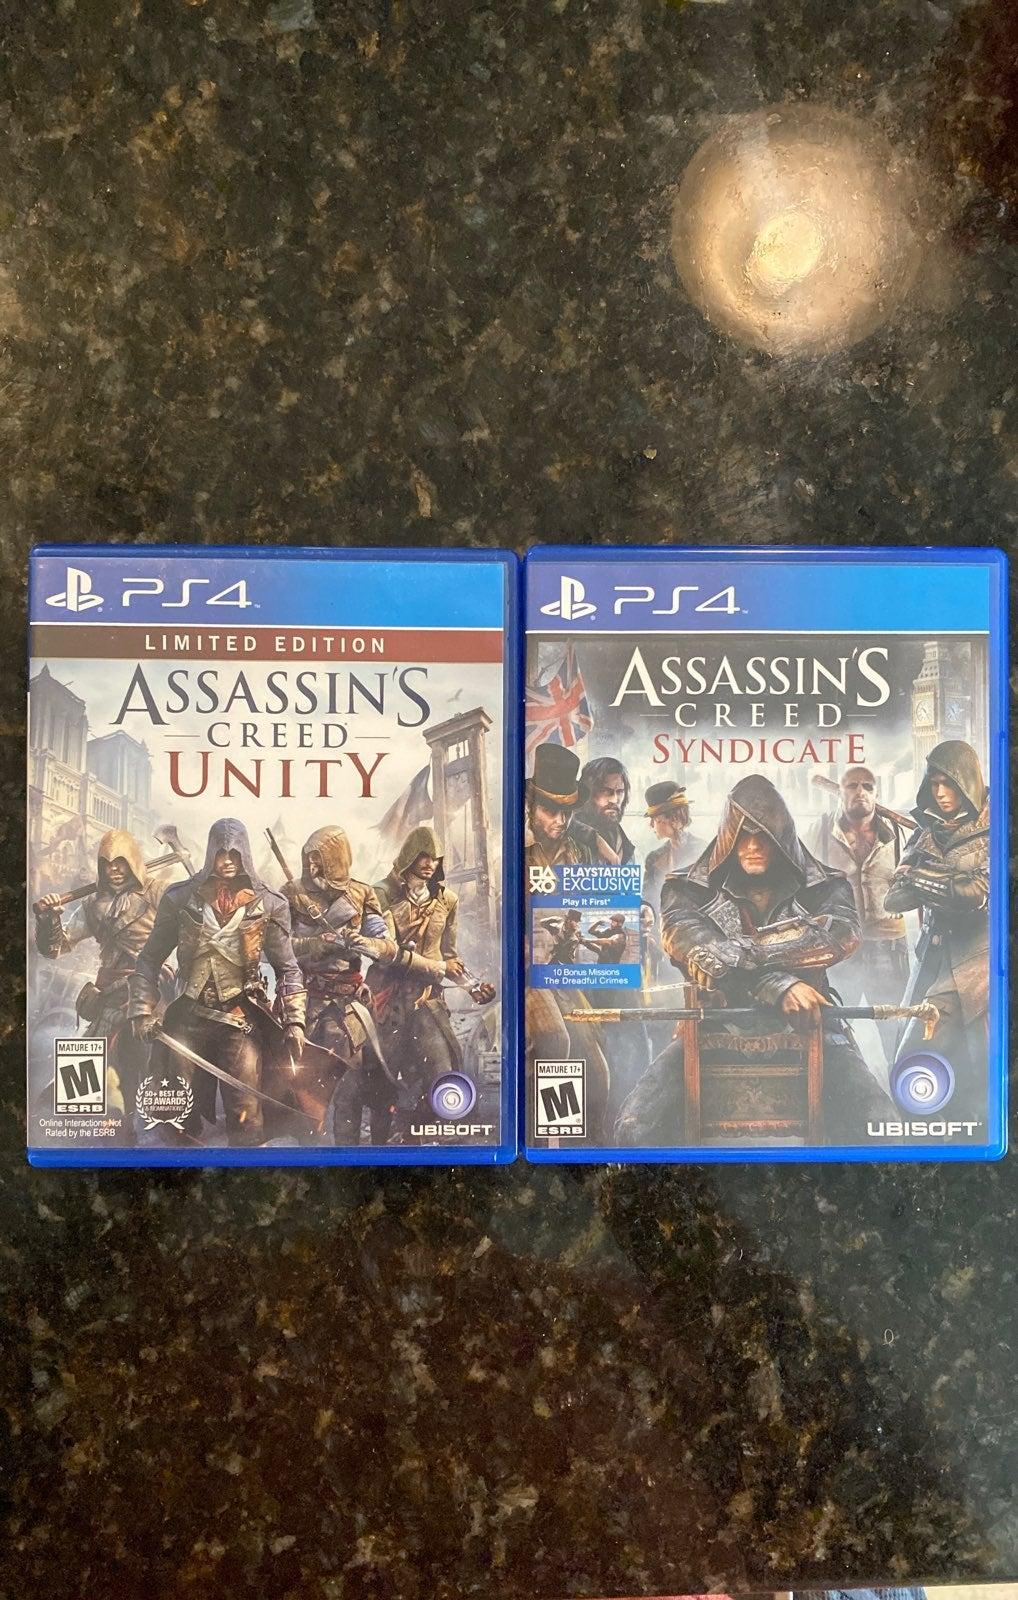 PS4 Assassins Creed Bundle